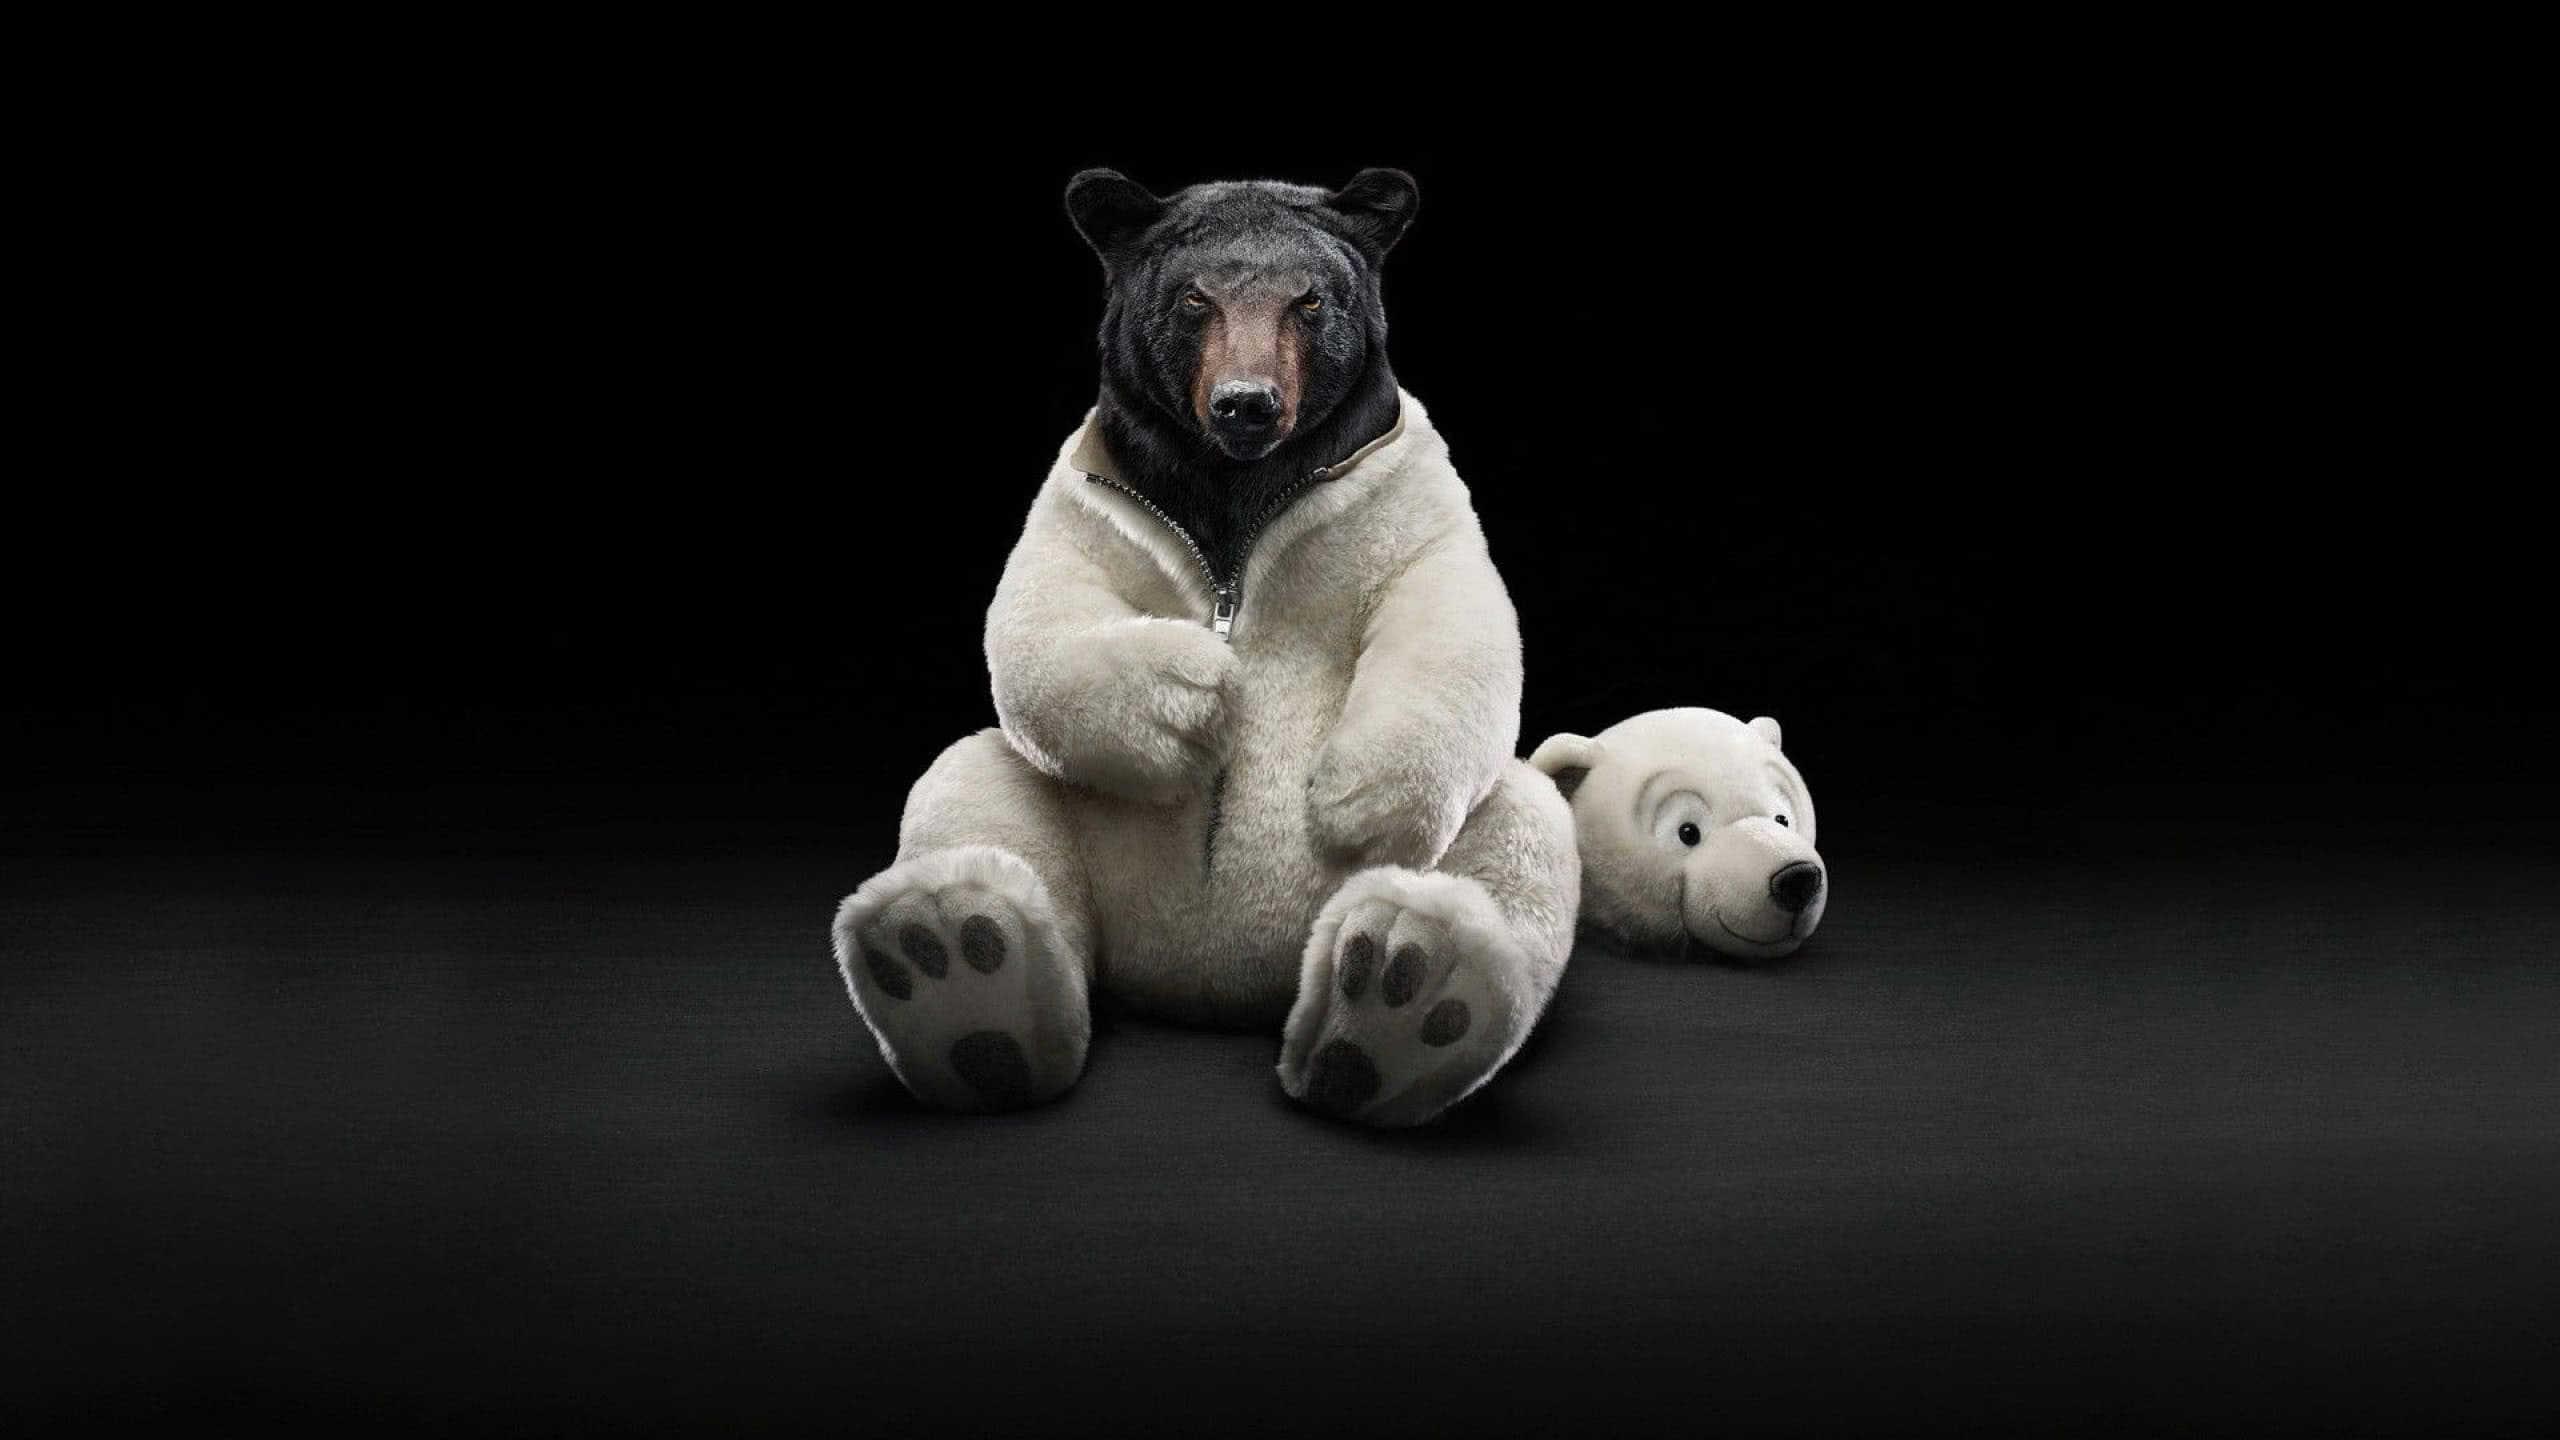 black bear in polar bear costume wqhd 1440p wallpaper